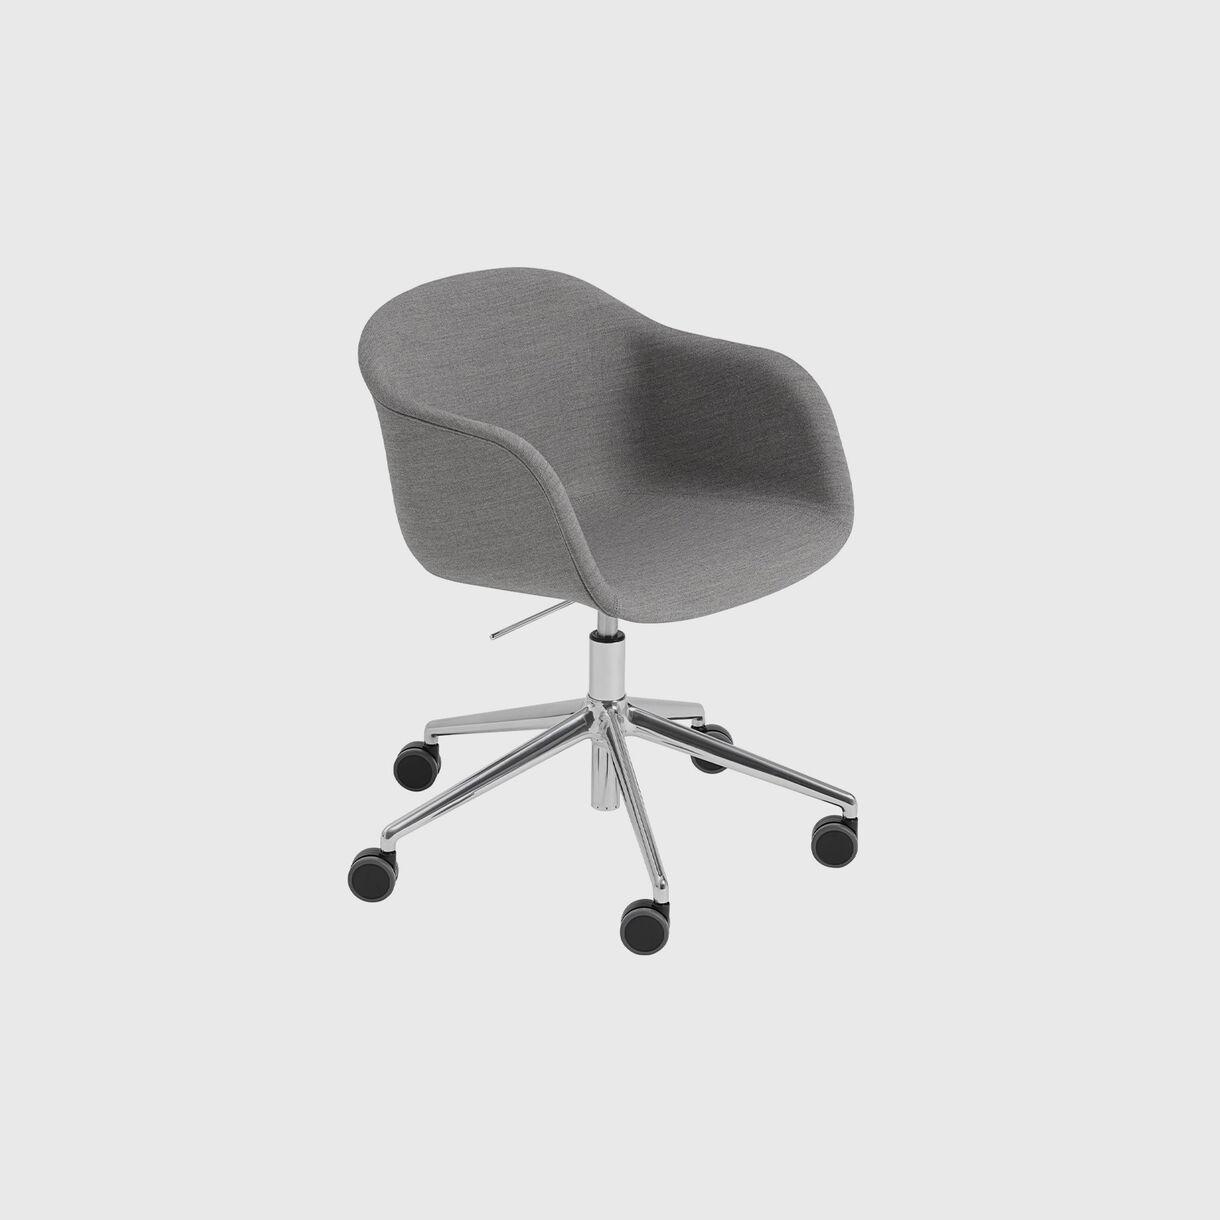 Fiber Armchair Upholstered, Remix 133 & Black, Swivel Base with Castors & Gas Lift, Grey